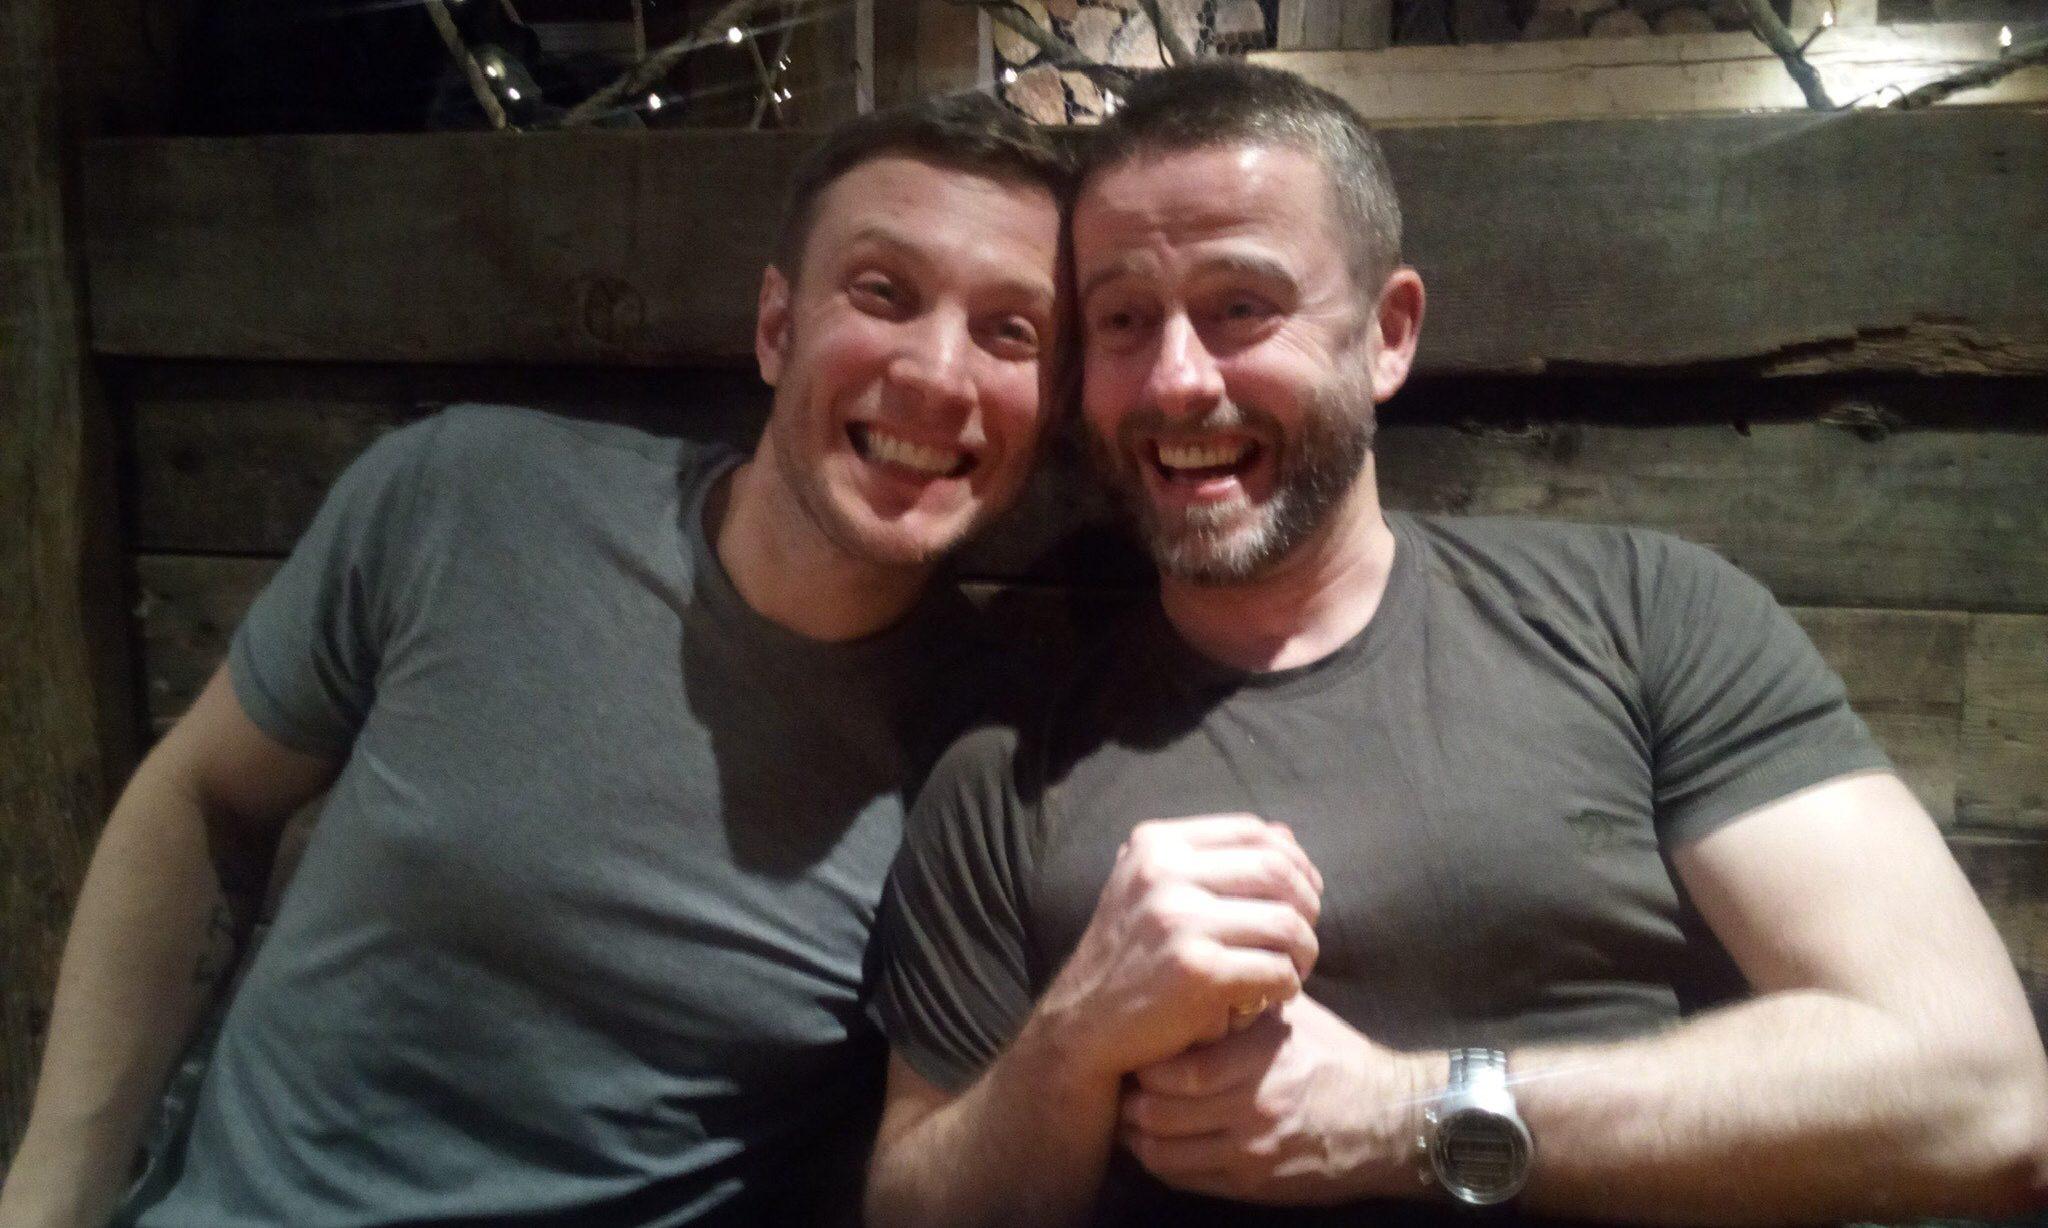 Stuart and Dougie